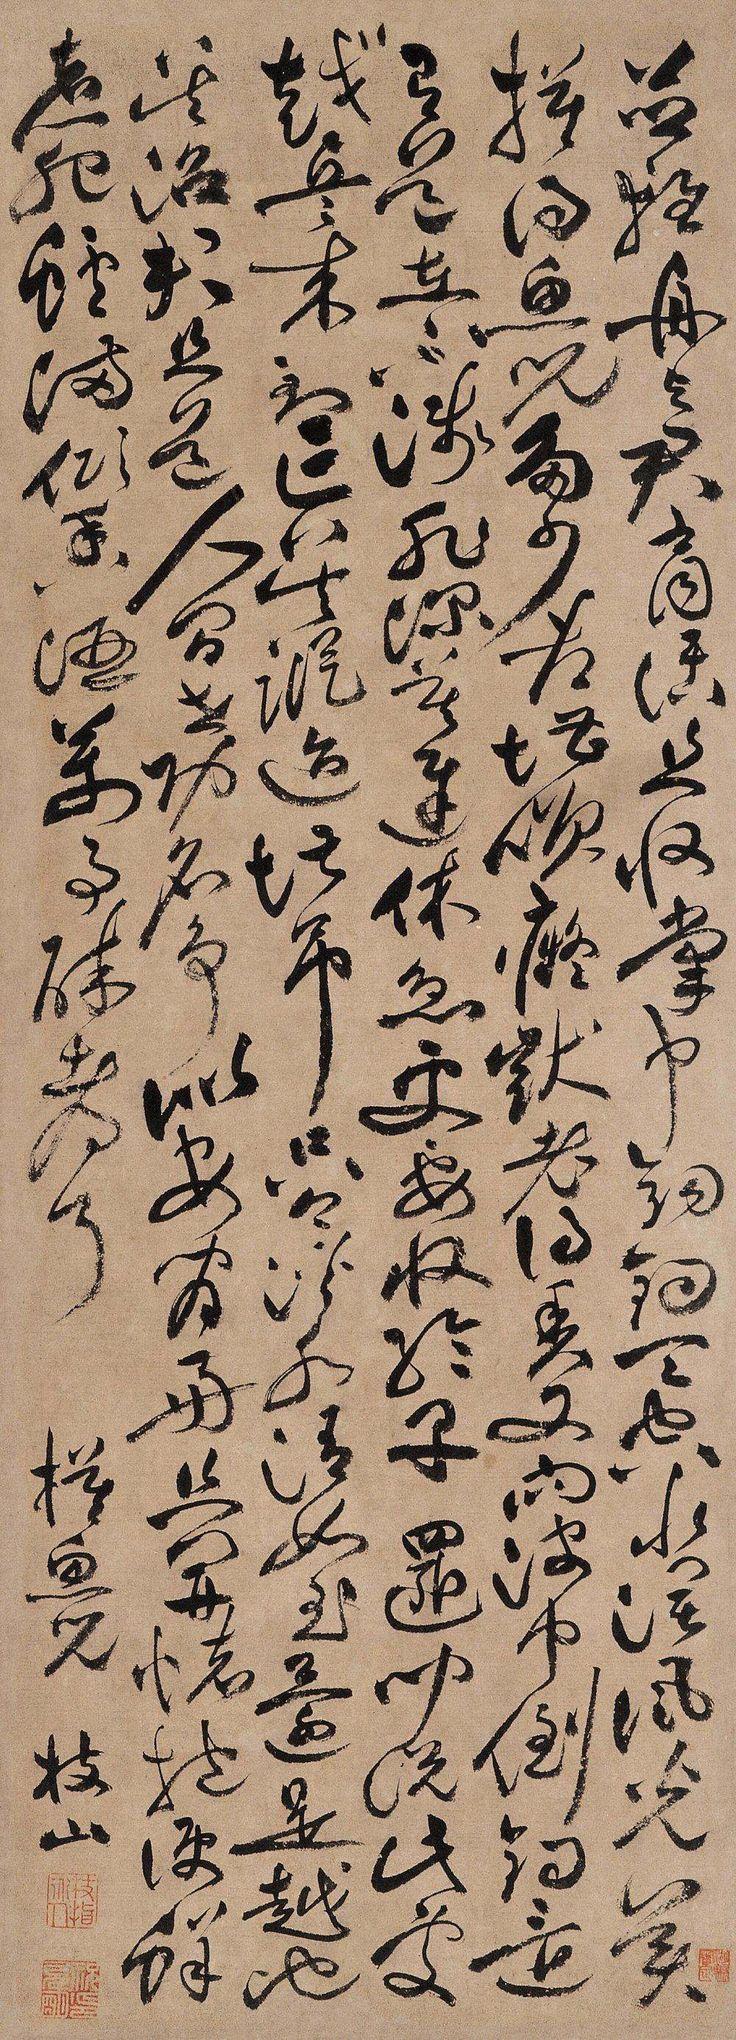 祝枝山 - Zhu Zhishan (1460-1526)